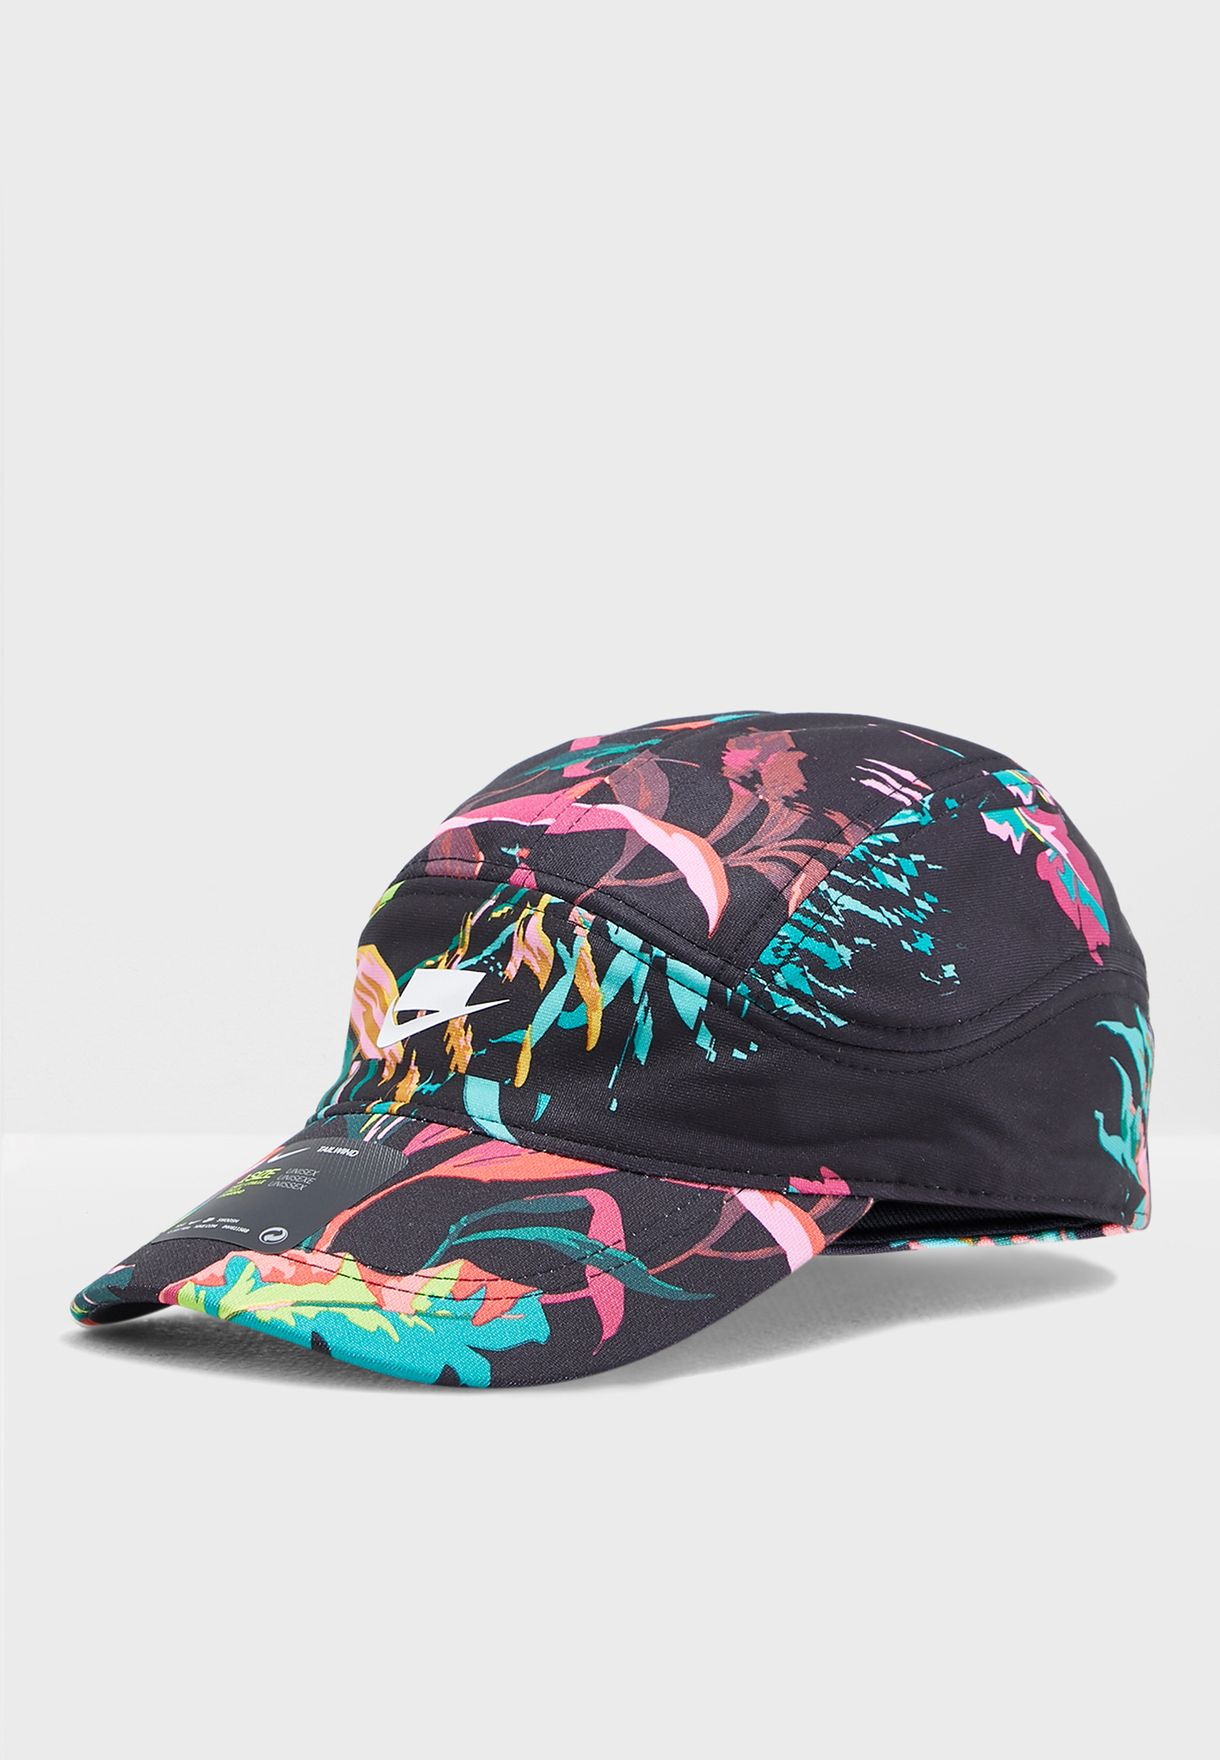 39d2f136d8864 Shop Nike prints NSW Tailwind Floral Cap AV6717-010 for Men in UAE ...